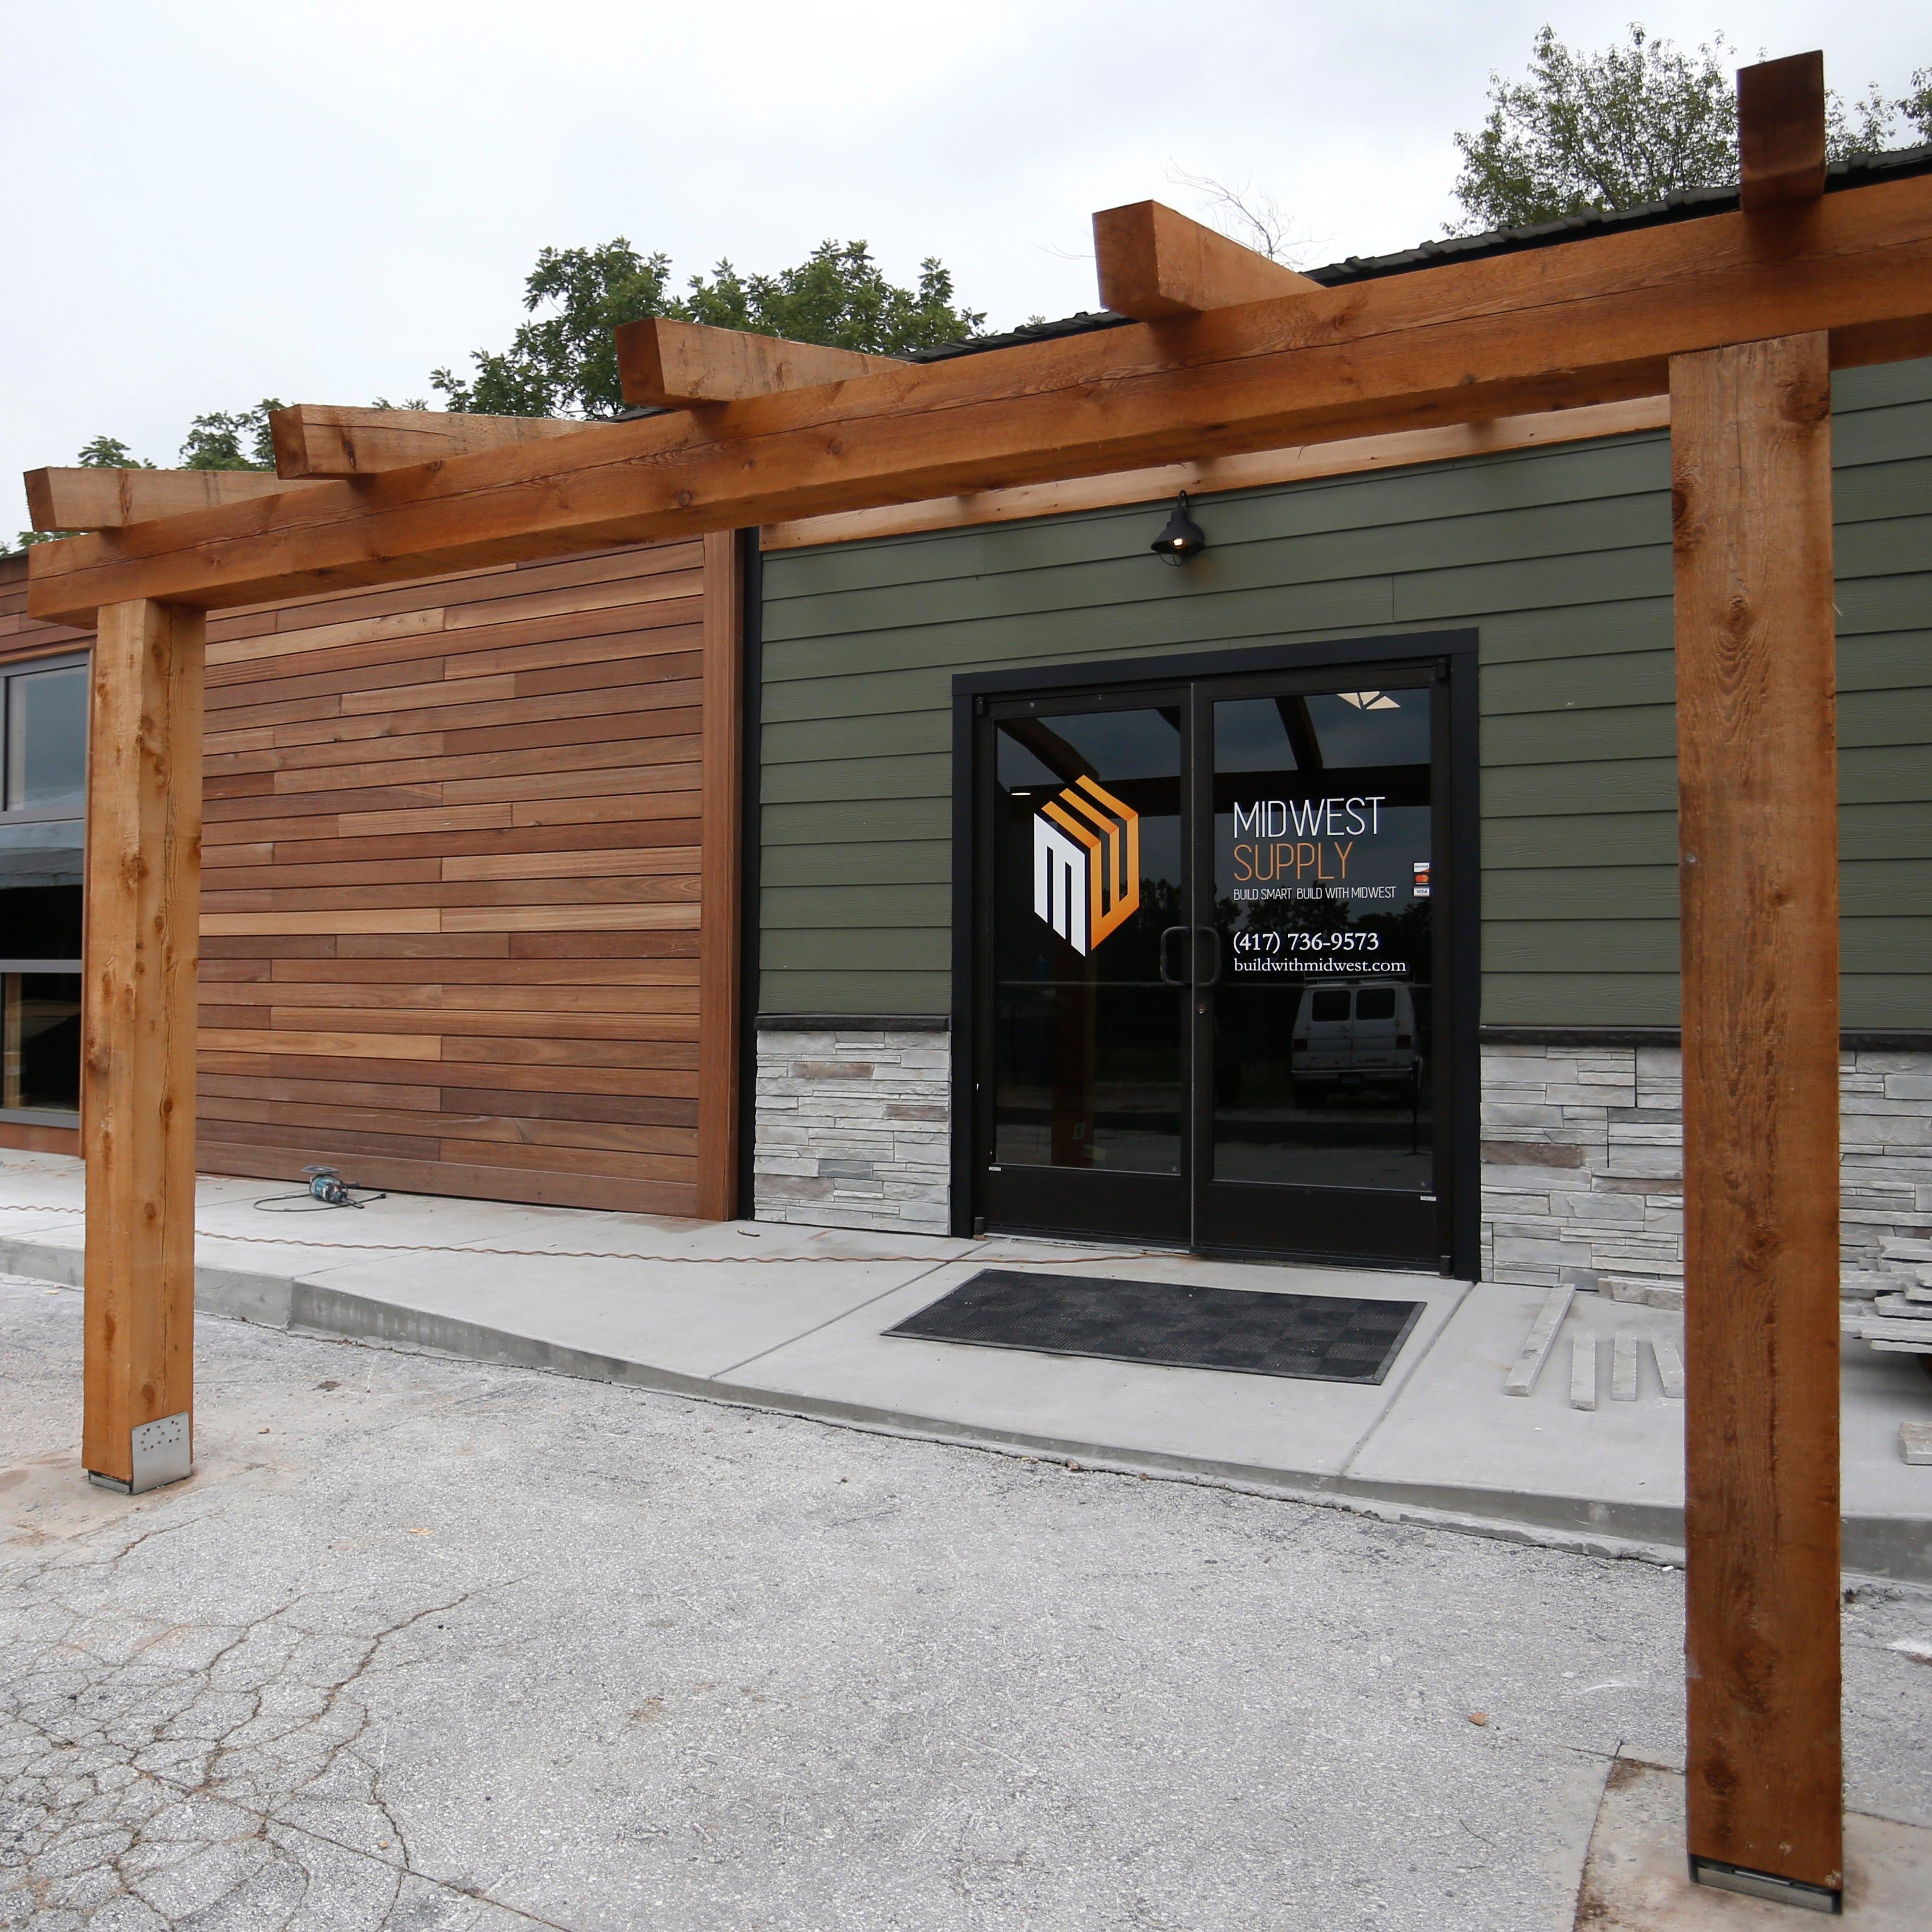 'Smarter lumberyard' to open in Strafford